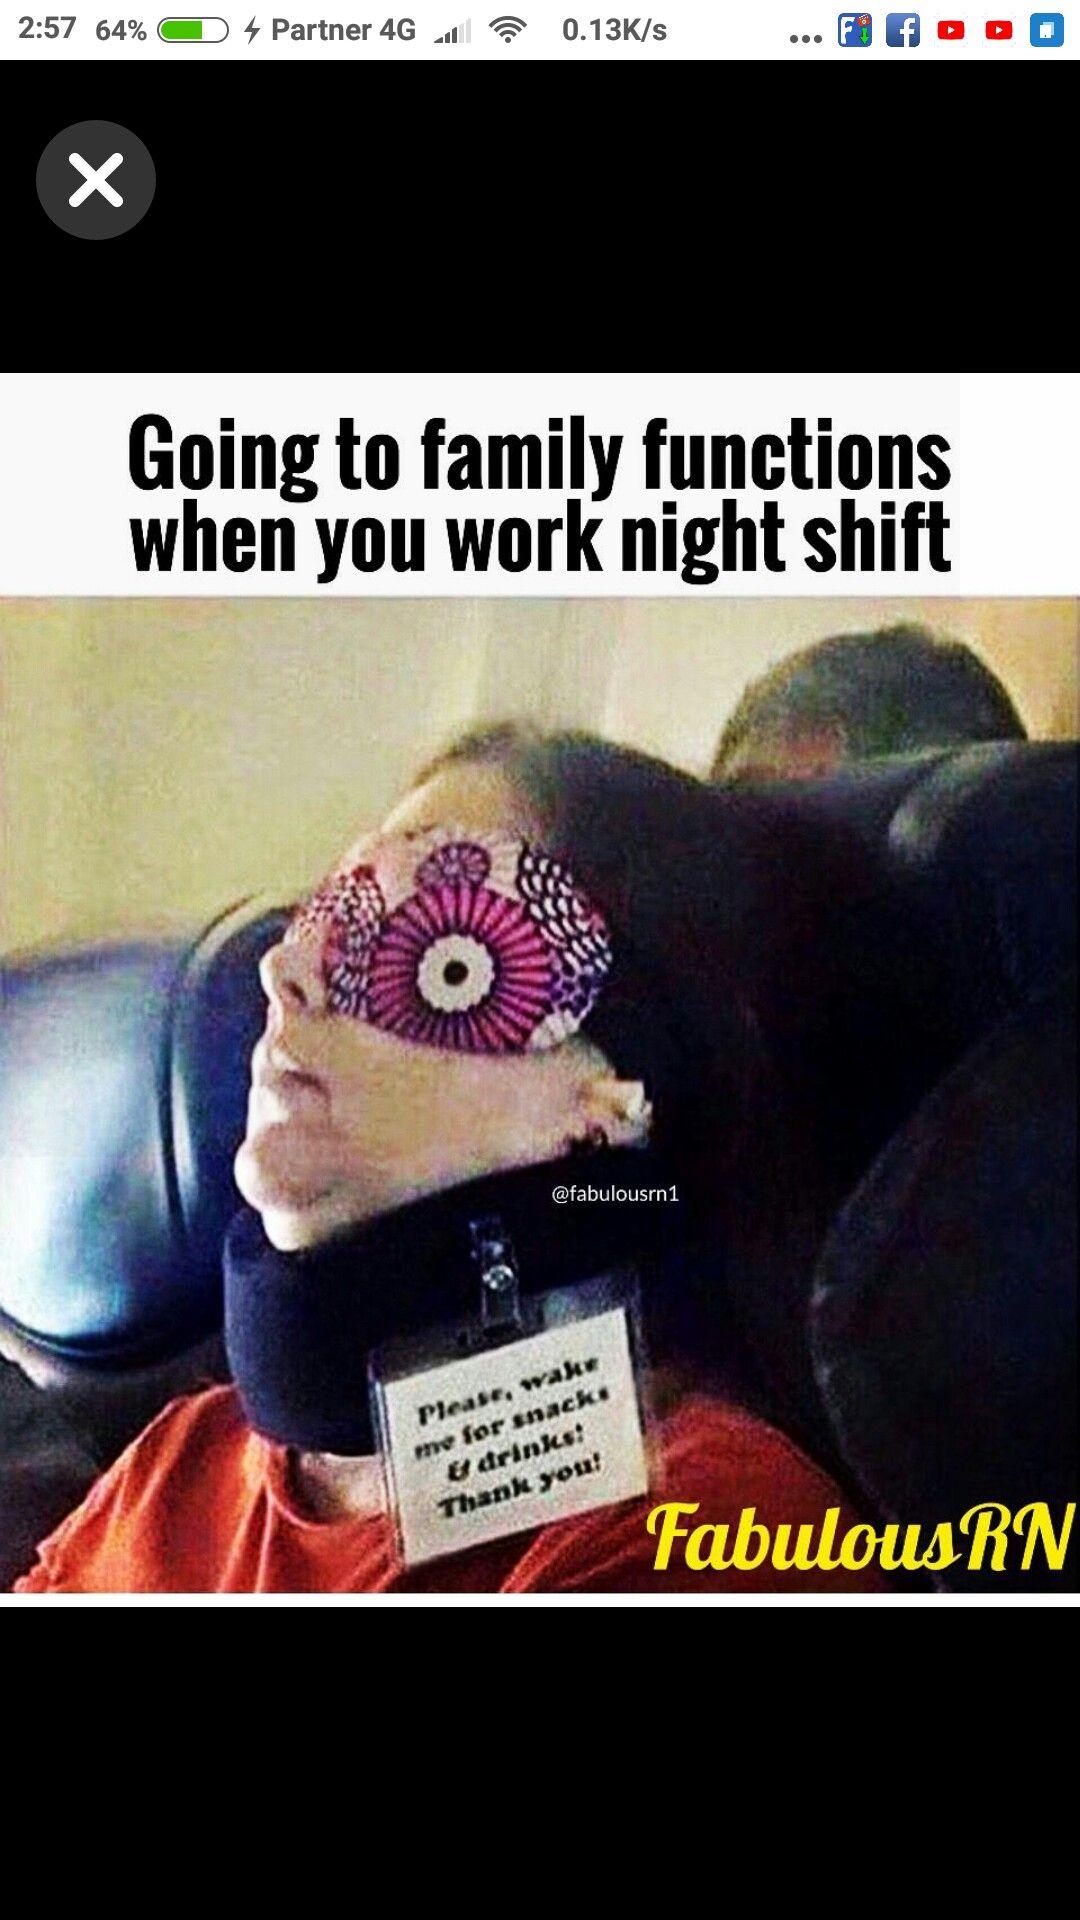 Bahahahha God Bless The Nurses Or Folks Who Work Late At Nite Or Like Vampires Lol Night Nurse Humor Night Shift Nurse Humor Night Shift Humor